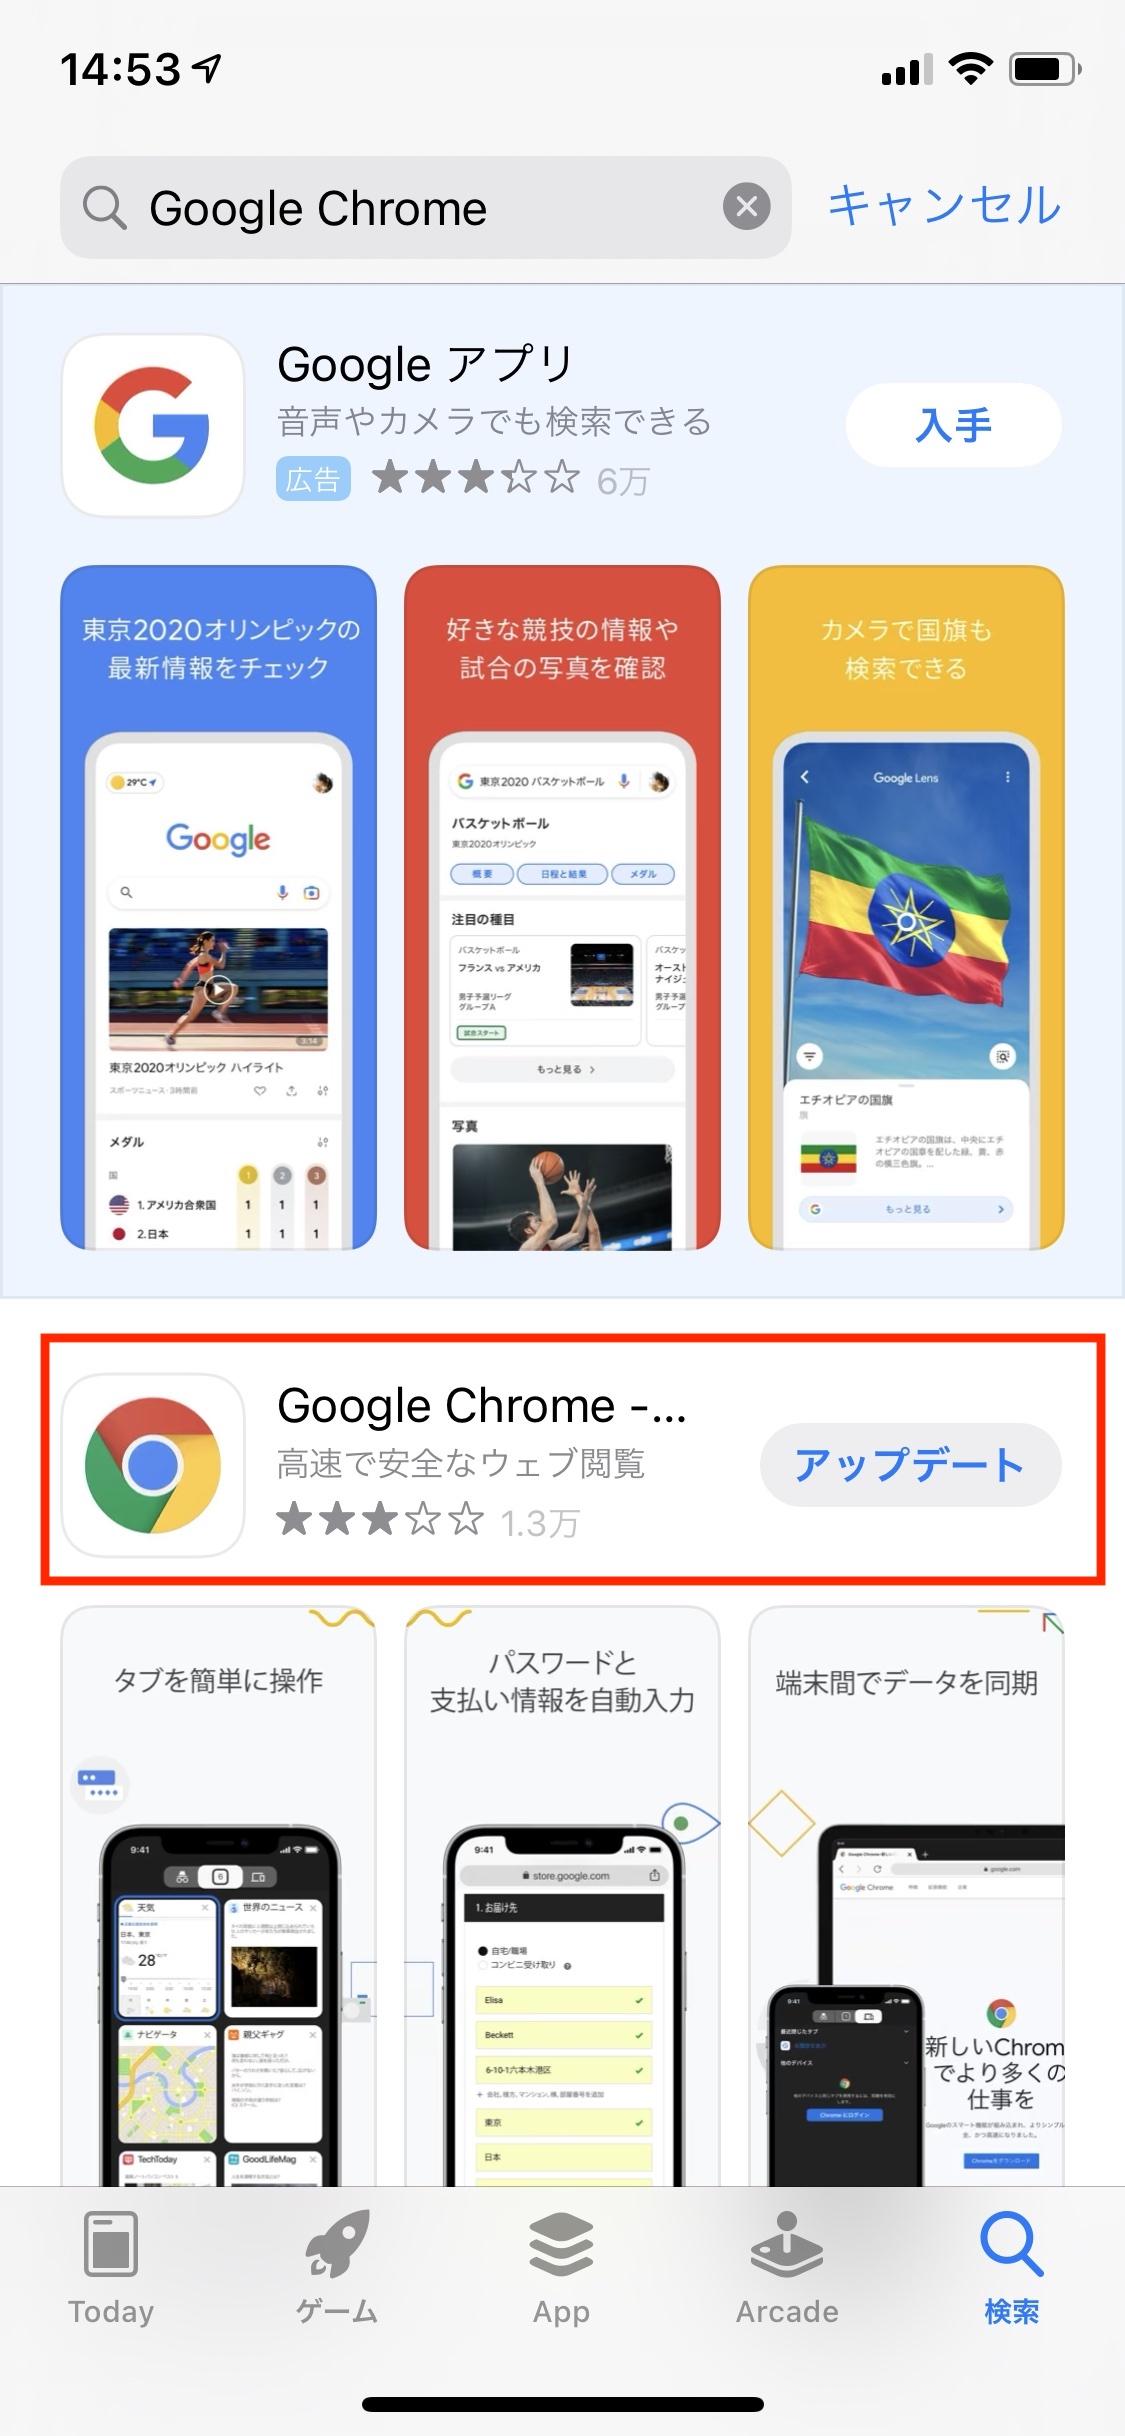 App StoreでGoogle Chromeを検索した結果